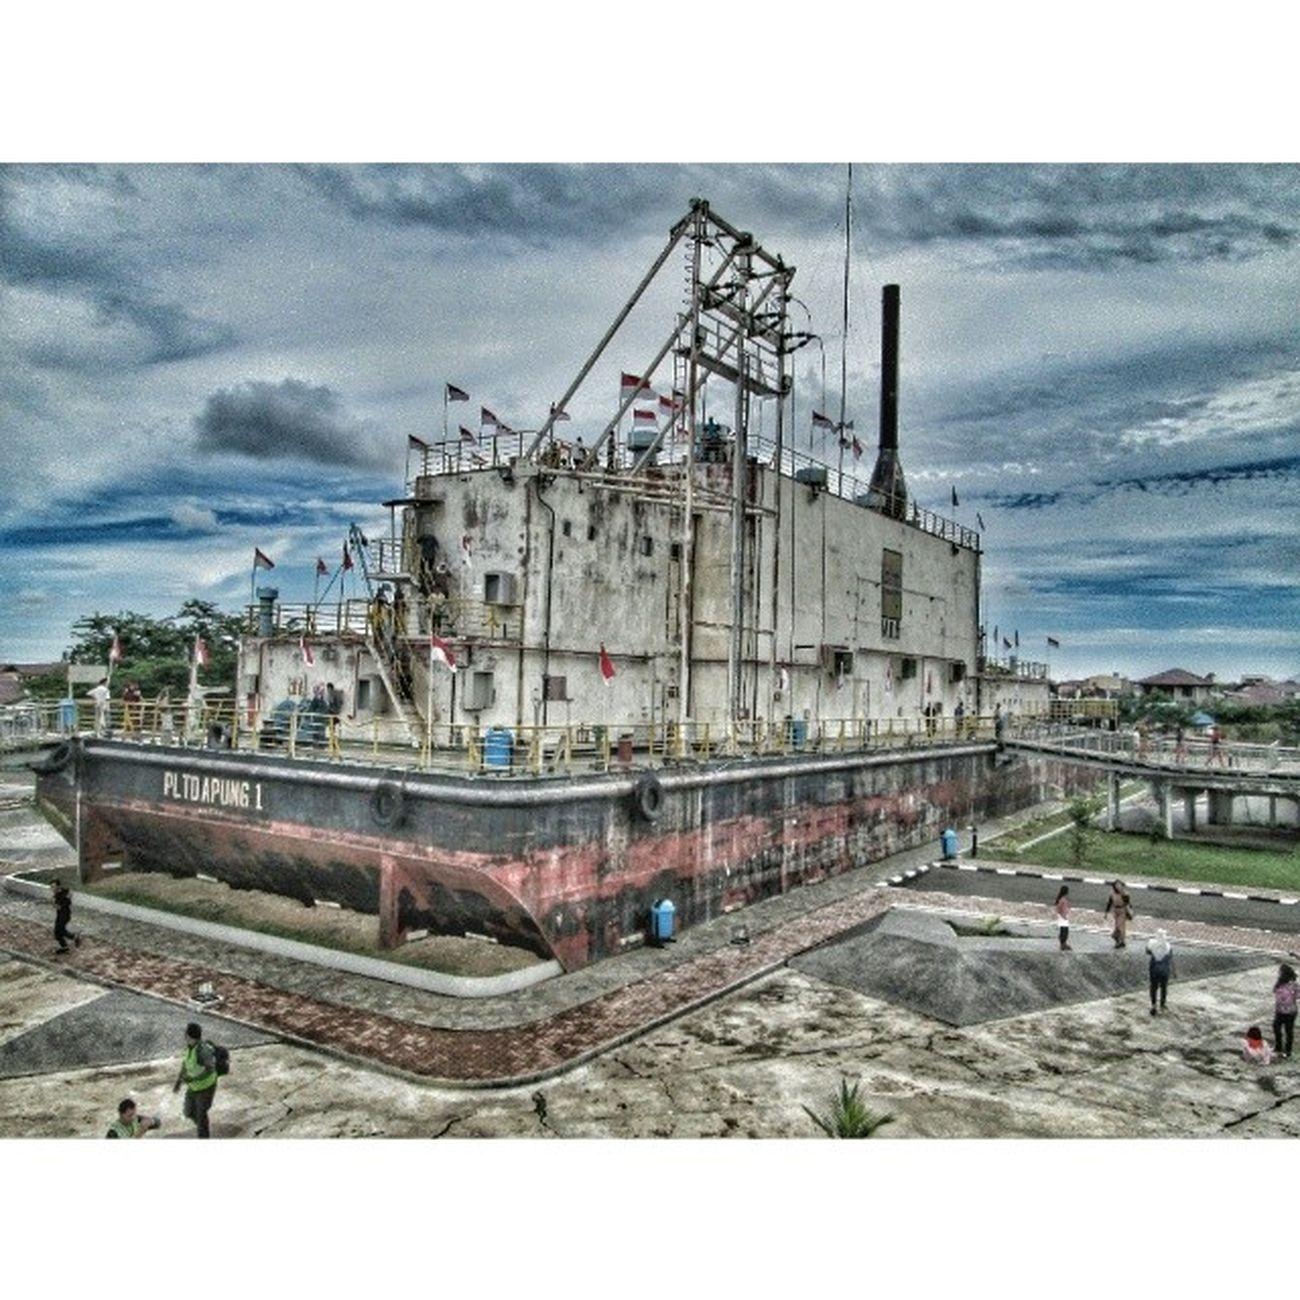 [Repost + Reedit] PLTD APUNG 1 adalah Pembangkit Listrik Tenaga Diesel lepas pantai dengan bobot 2600 ton yang didorong sejauh 5km ke daratan oleh kedahsyatan Tsunami [ 26 Des 2004 ]. Sekarang berlokasi di Gampong Punge Blang Cut, Kota Banda Aceh Pict courtesy by @innokribow Edited by @uledivo_gi Inub2613 Instanusantara Instanusantaramedan Earthquake tsunami aceh